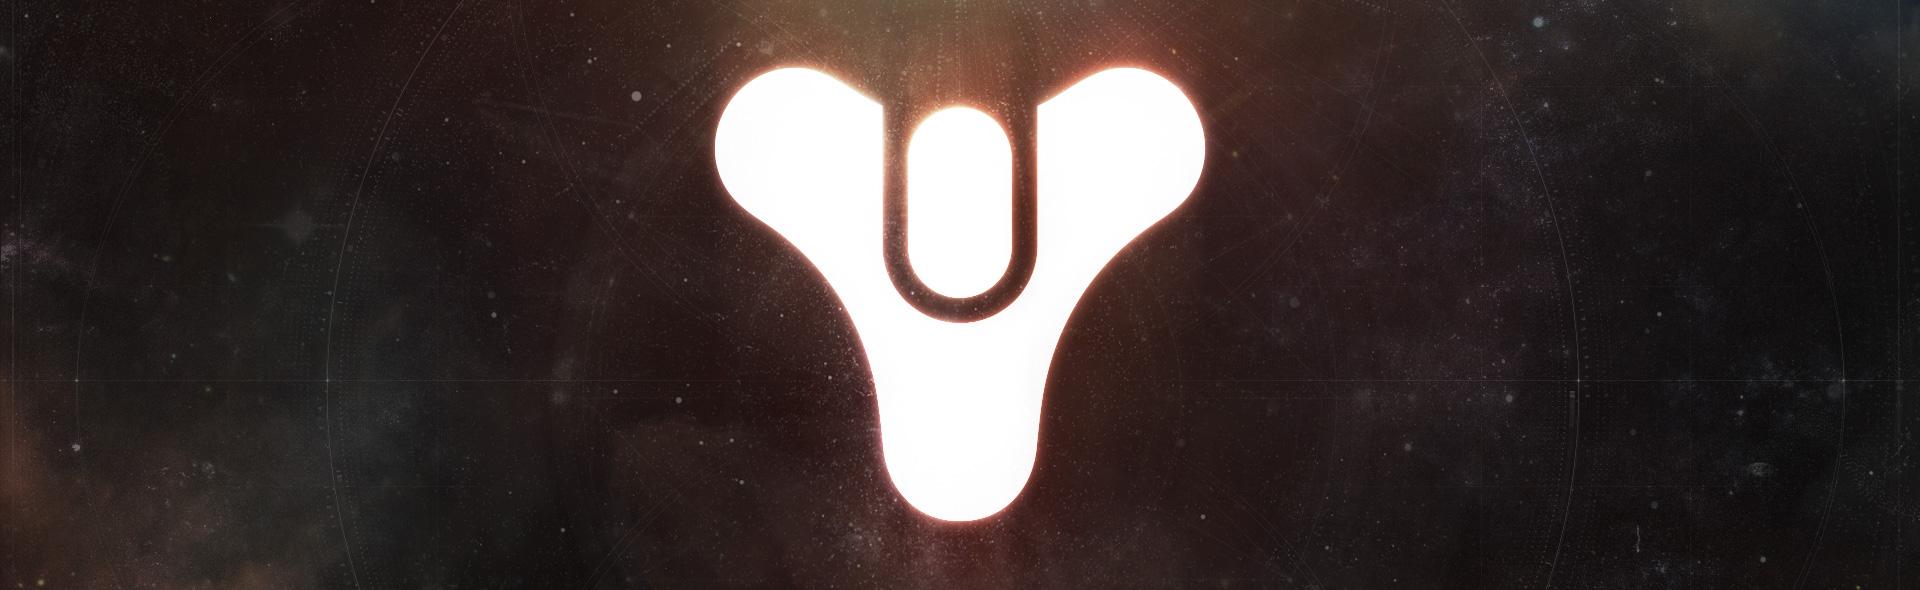 Destiny Development Roadmap – 07/25/2018